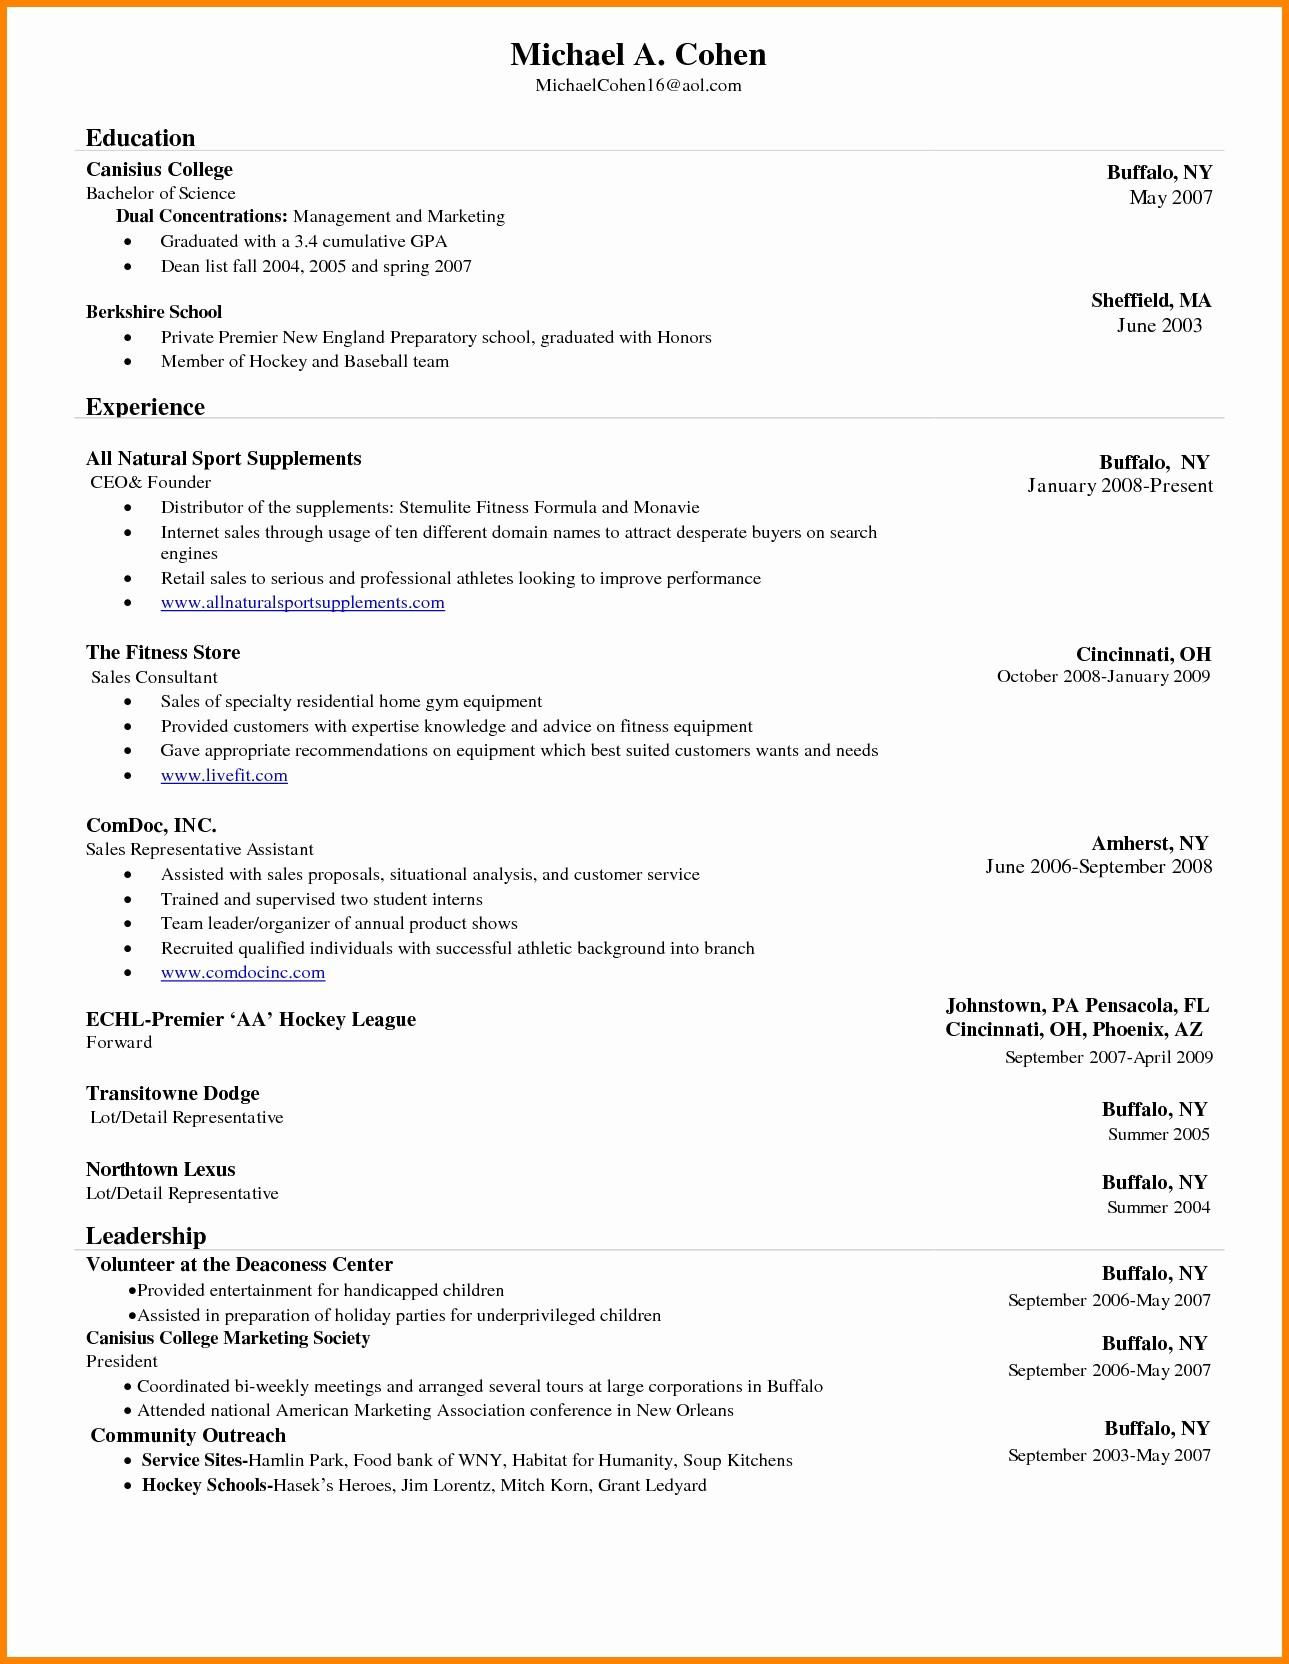 Microsoft Word Resume Template 2017 Unique Resume Template Microsoft Word 2017